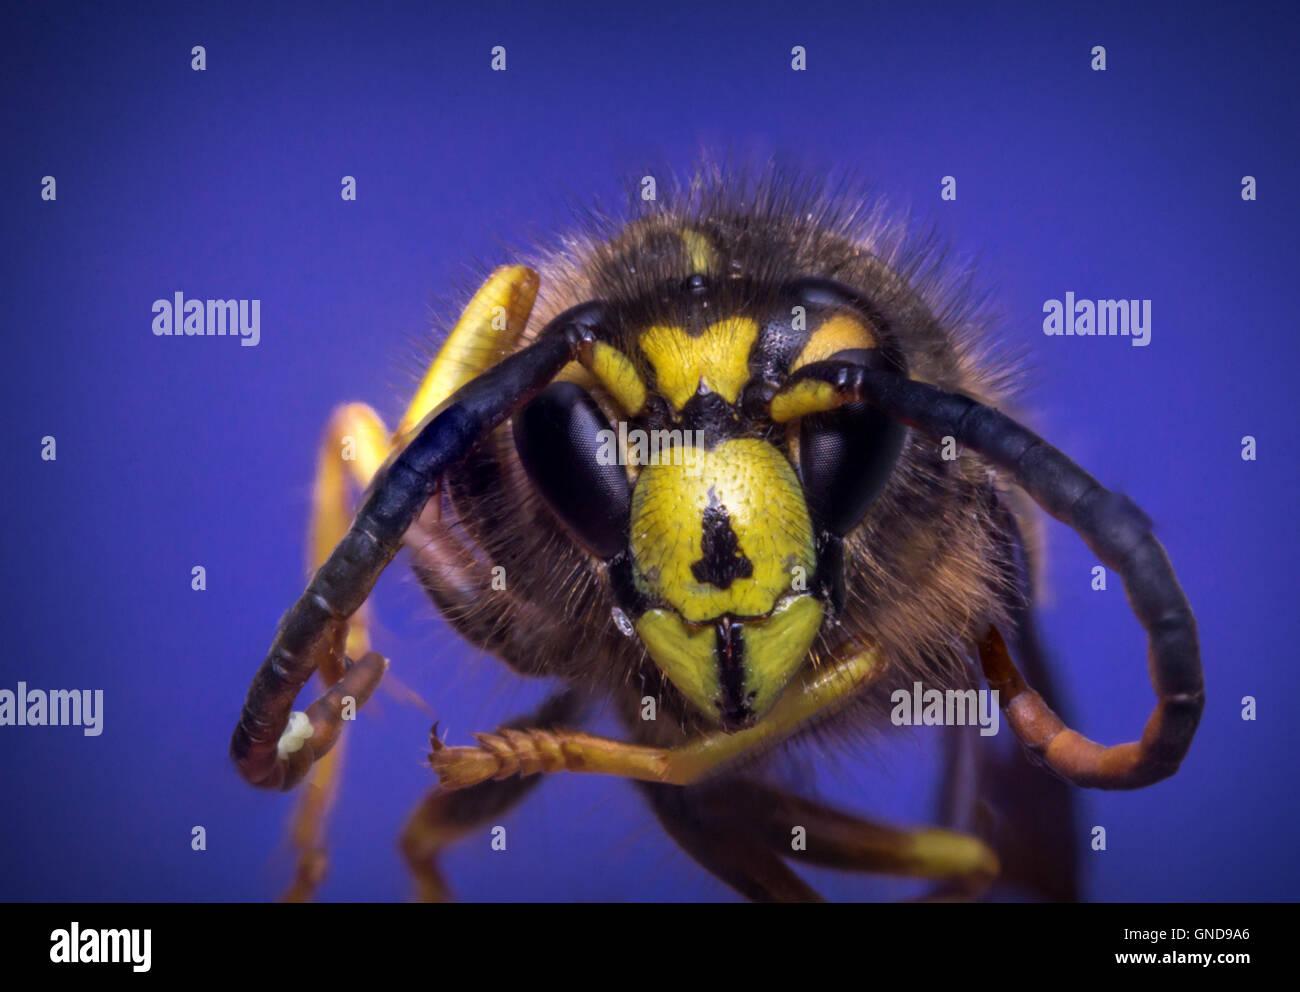 Close up macro scary yellow jacket wasp flying against blue sky - Stock Image